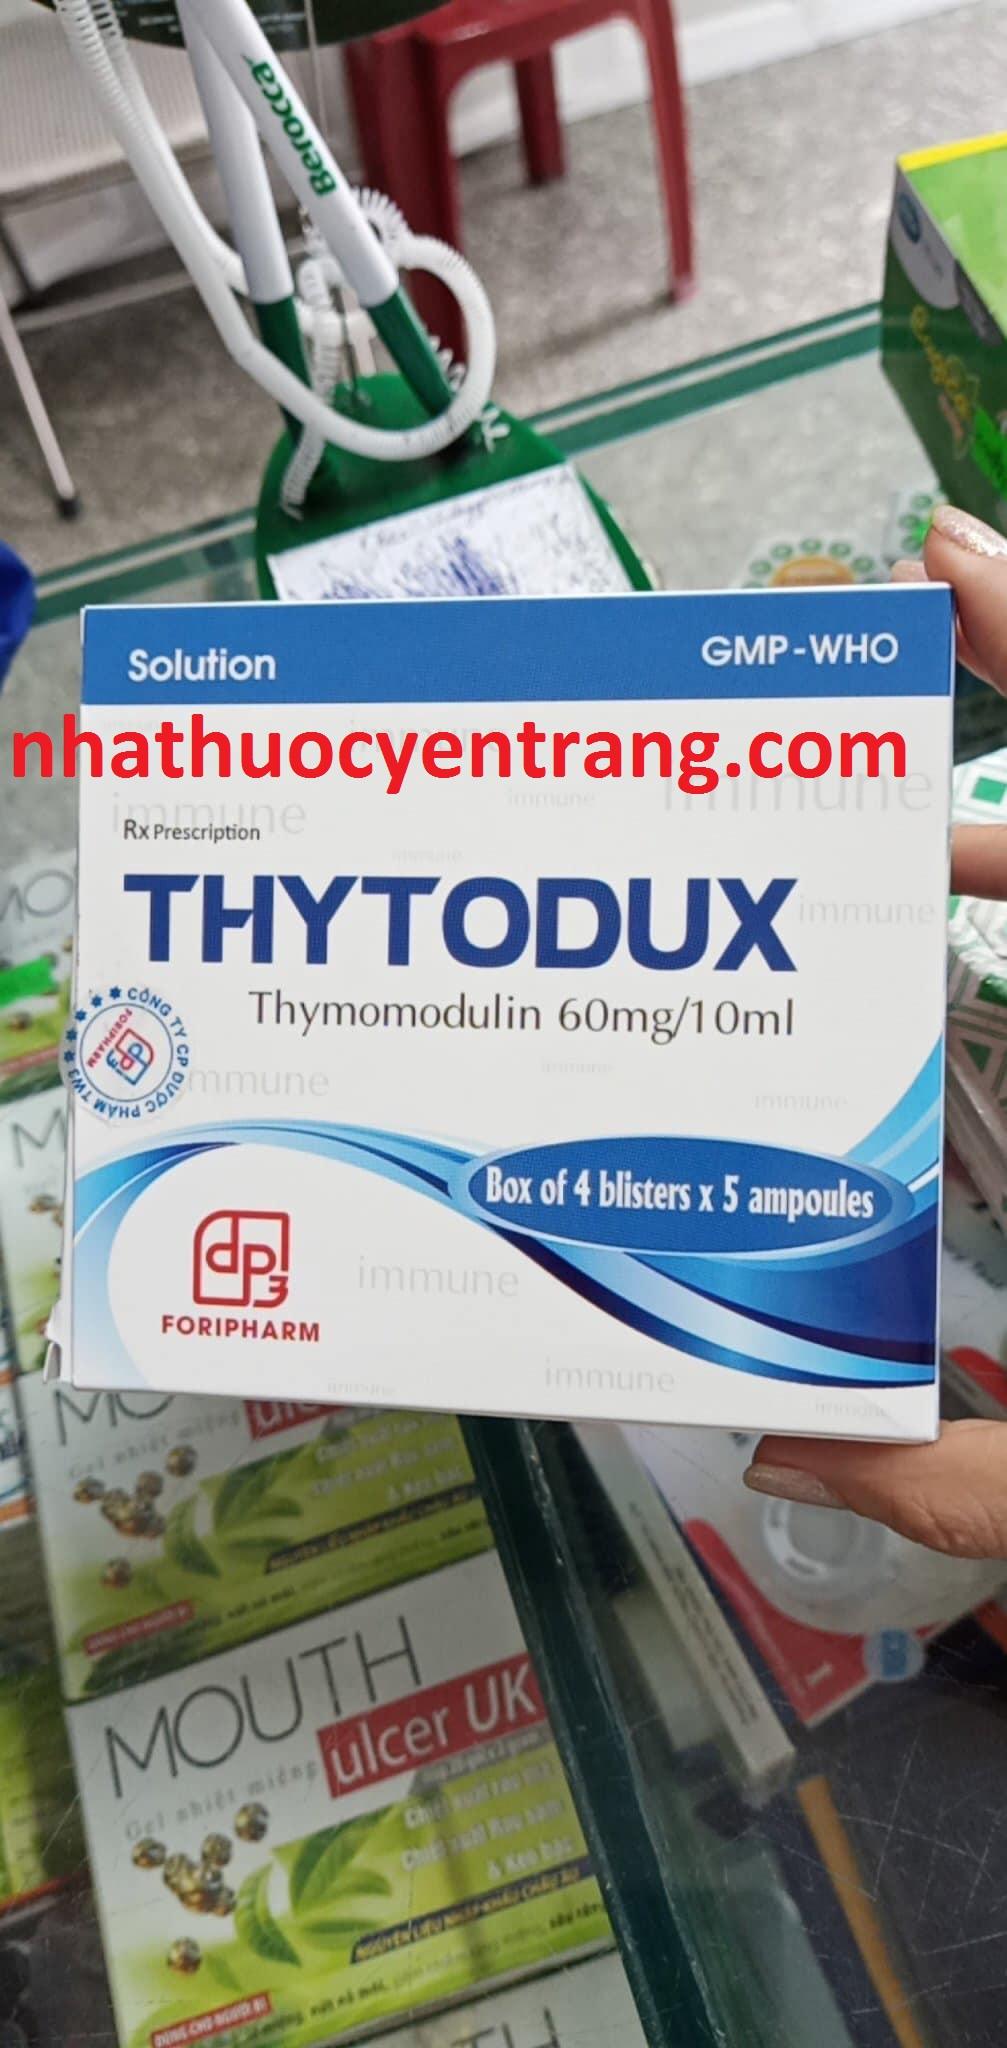 Thytodux